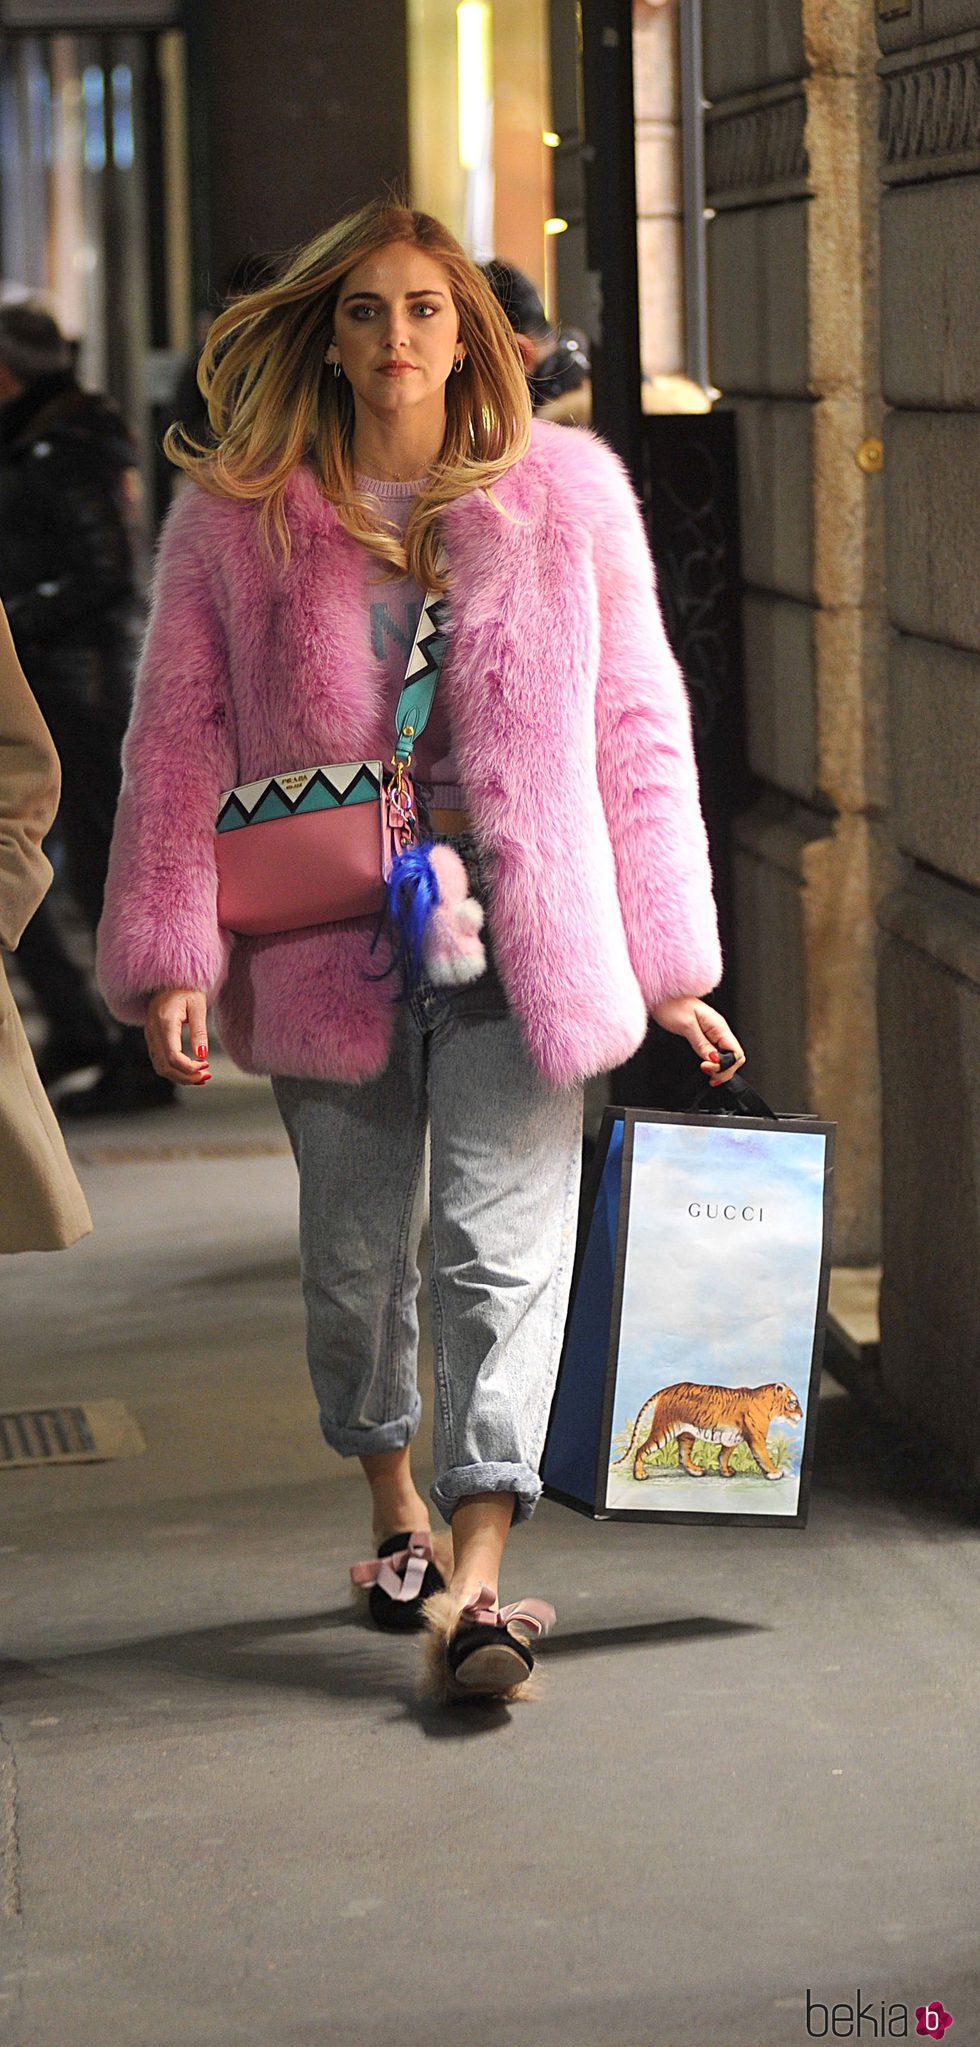 fb3687e75c1 Chiara Ferragni con un abrigo de pelo en color rosa en las calles de Italia